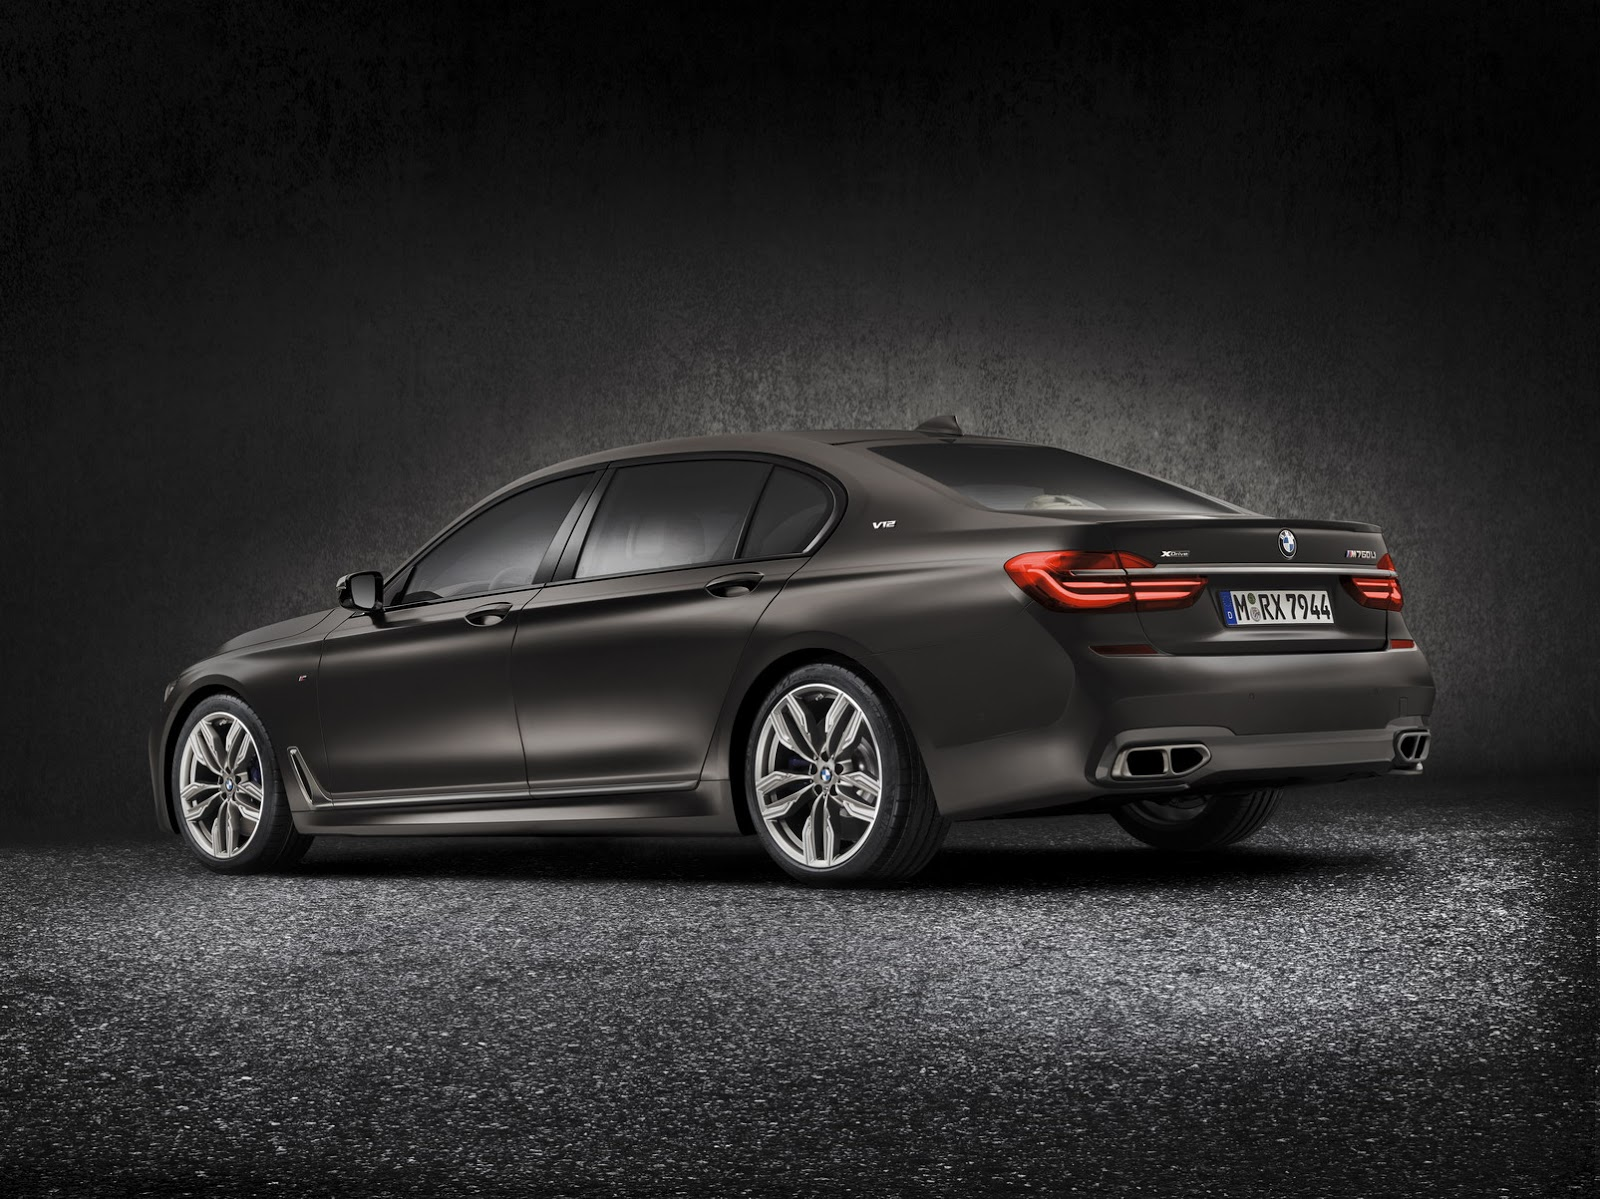 BMW M7 Price >> New BMW M760Li xDrive Gets Massive 6.6-Liter V12 Turbo With 600 Horses | Carscoops